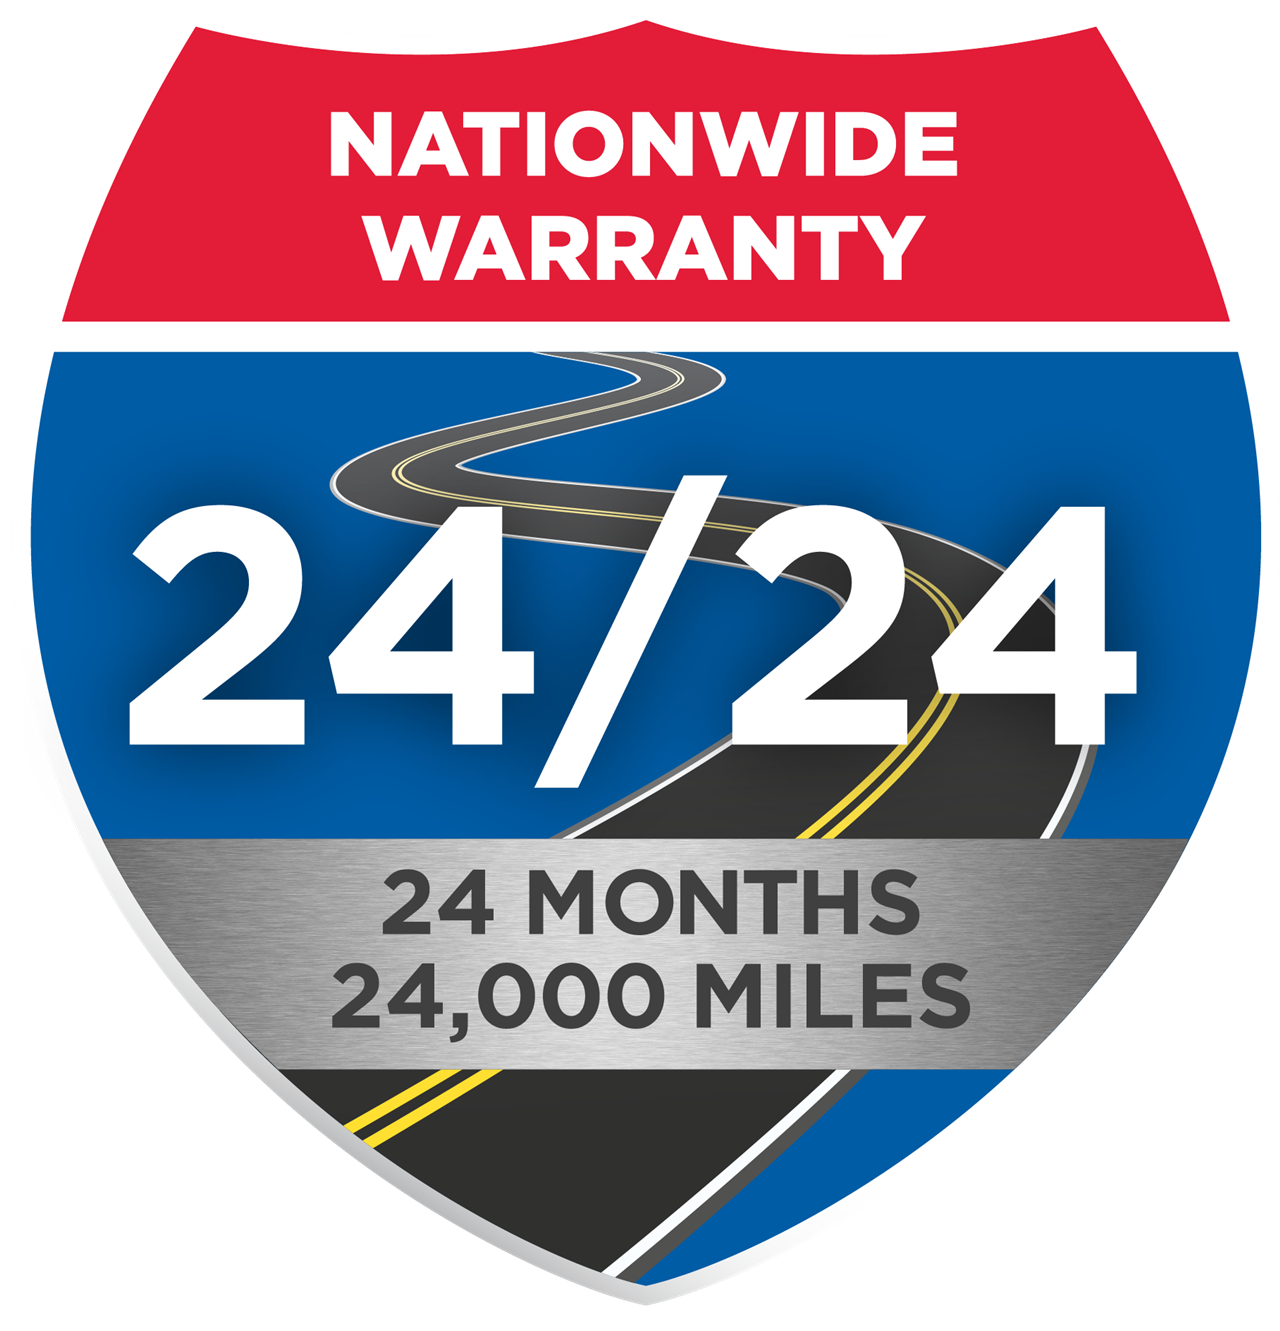 Nationwide Peace of Mind Warranty